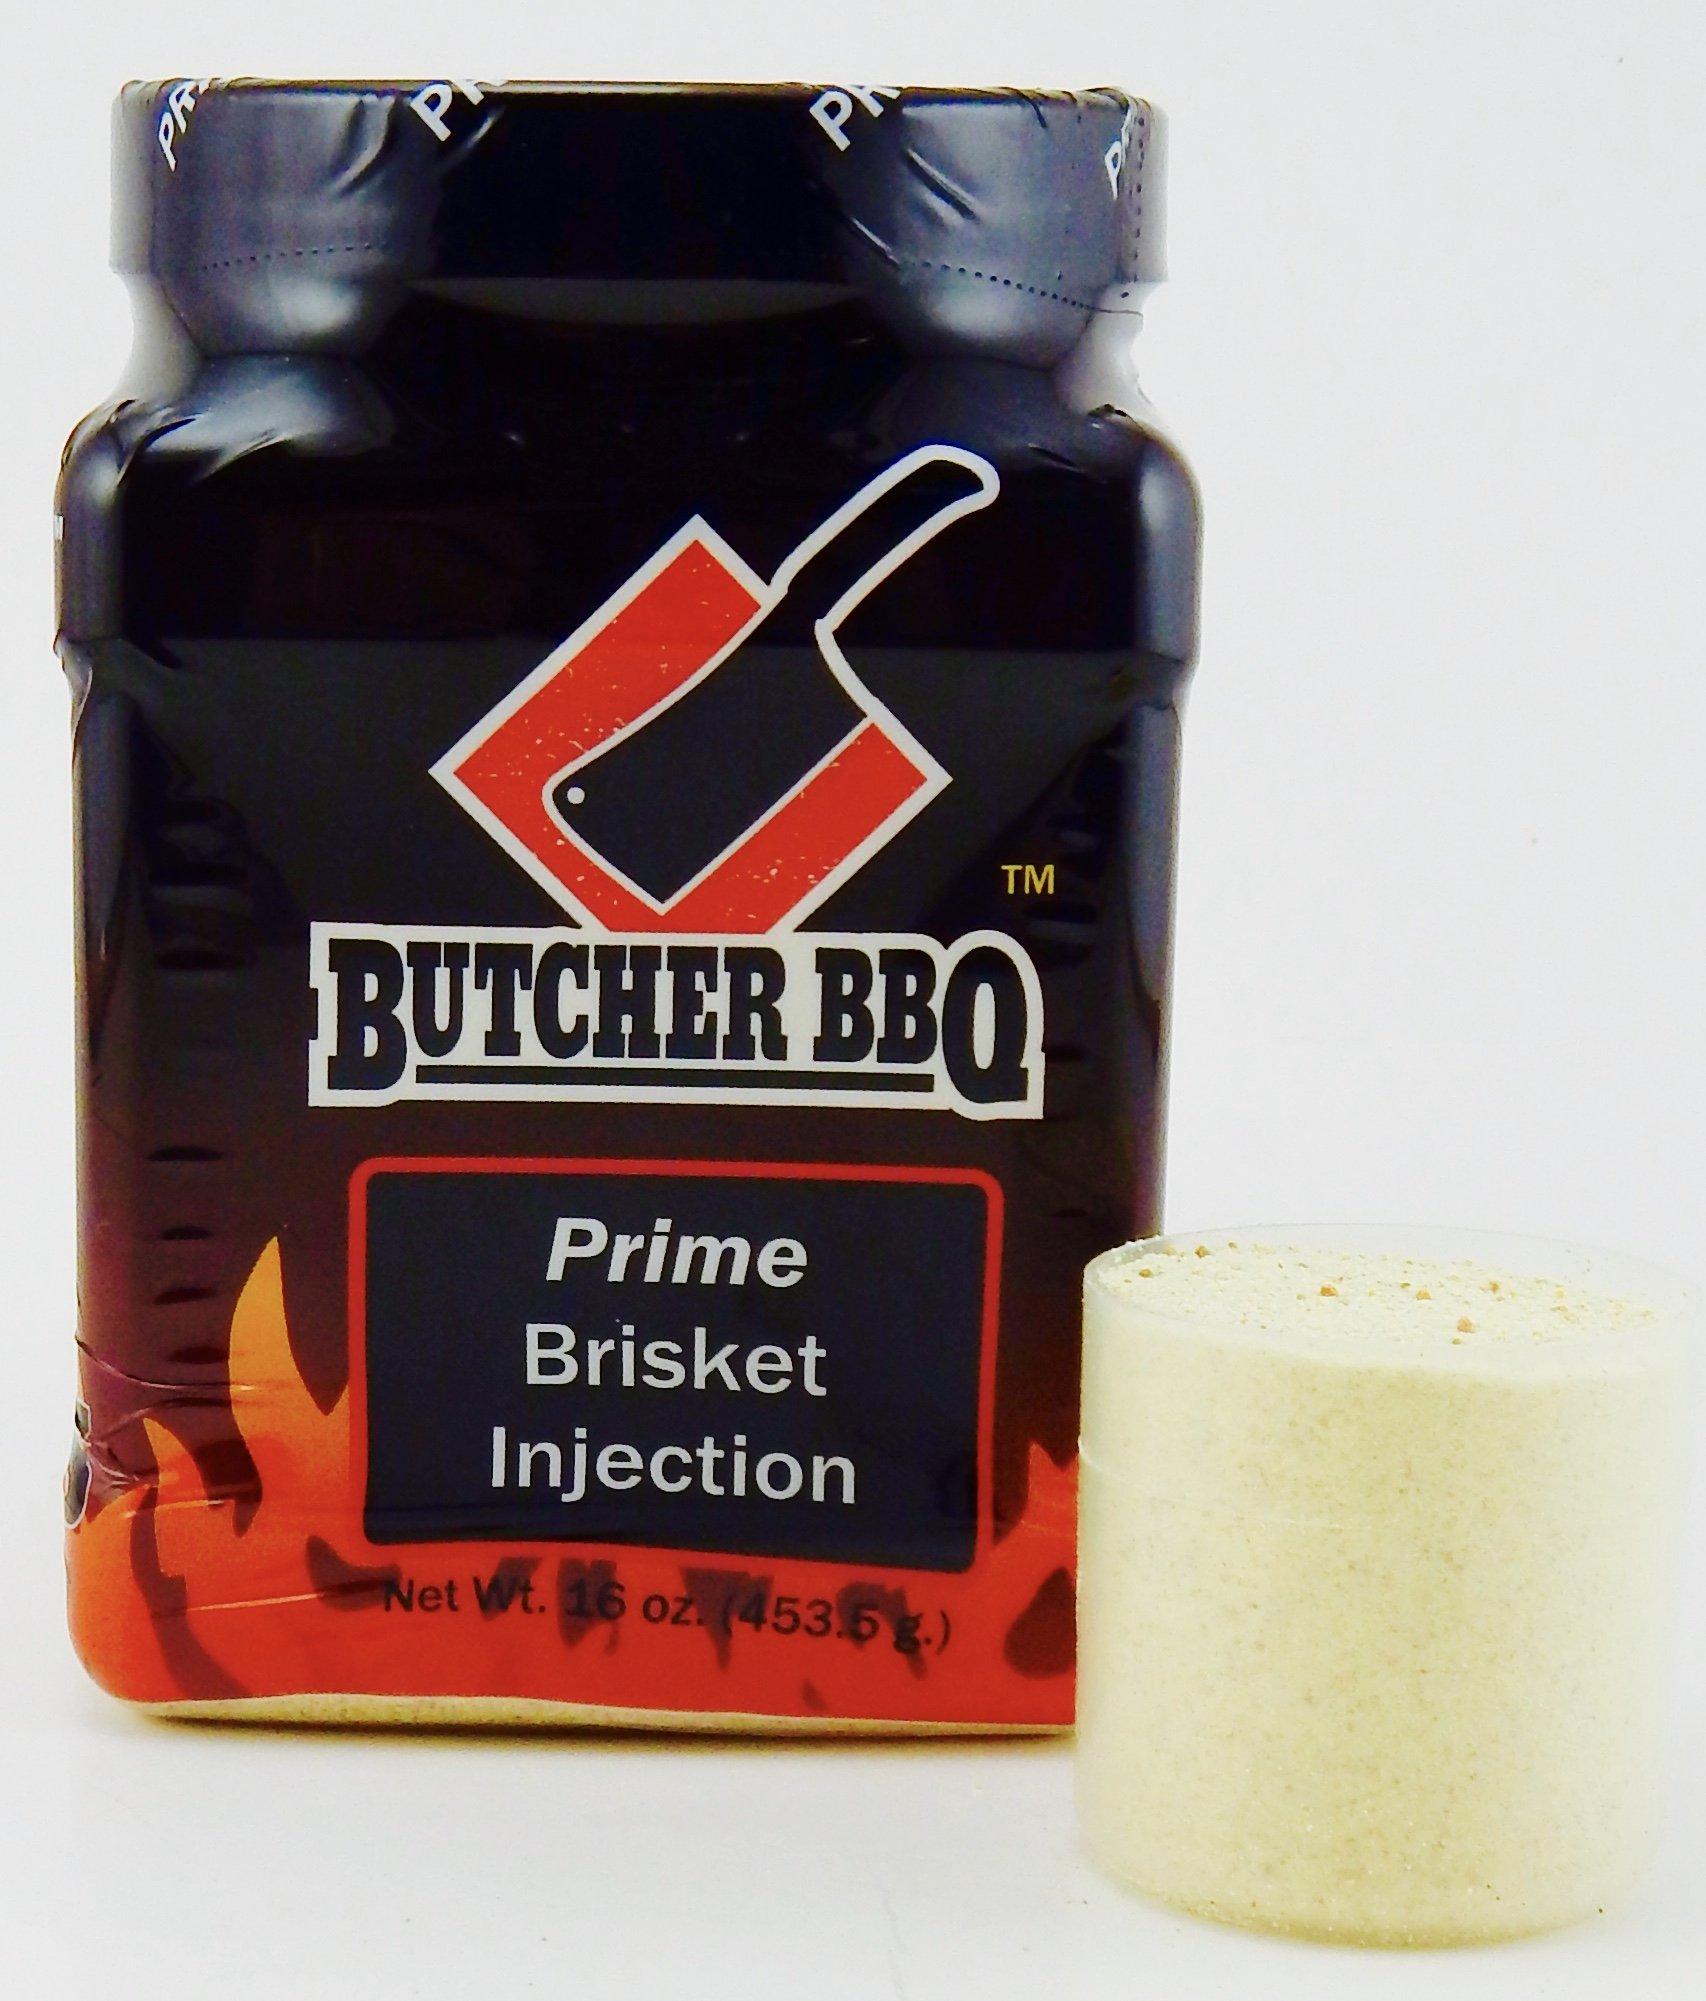 Butcher BBQ Prime Brisket Injection 1 pound by Butcher BBQ (Image #1)